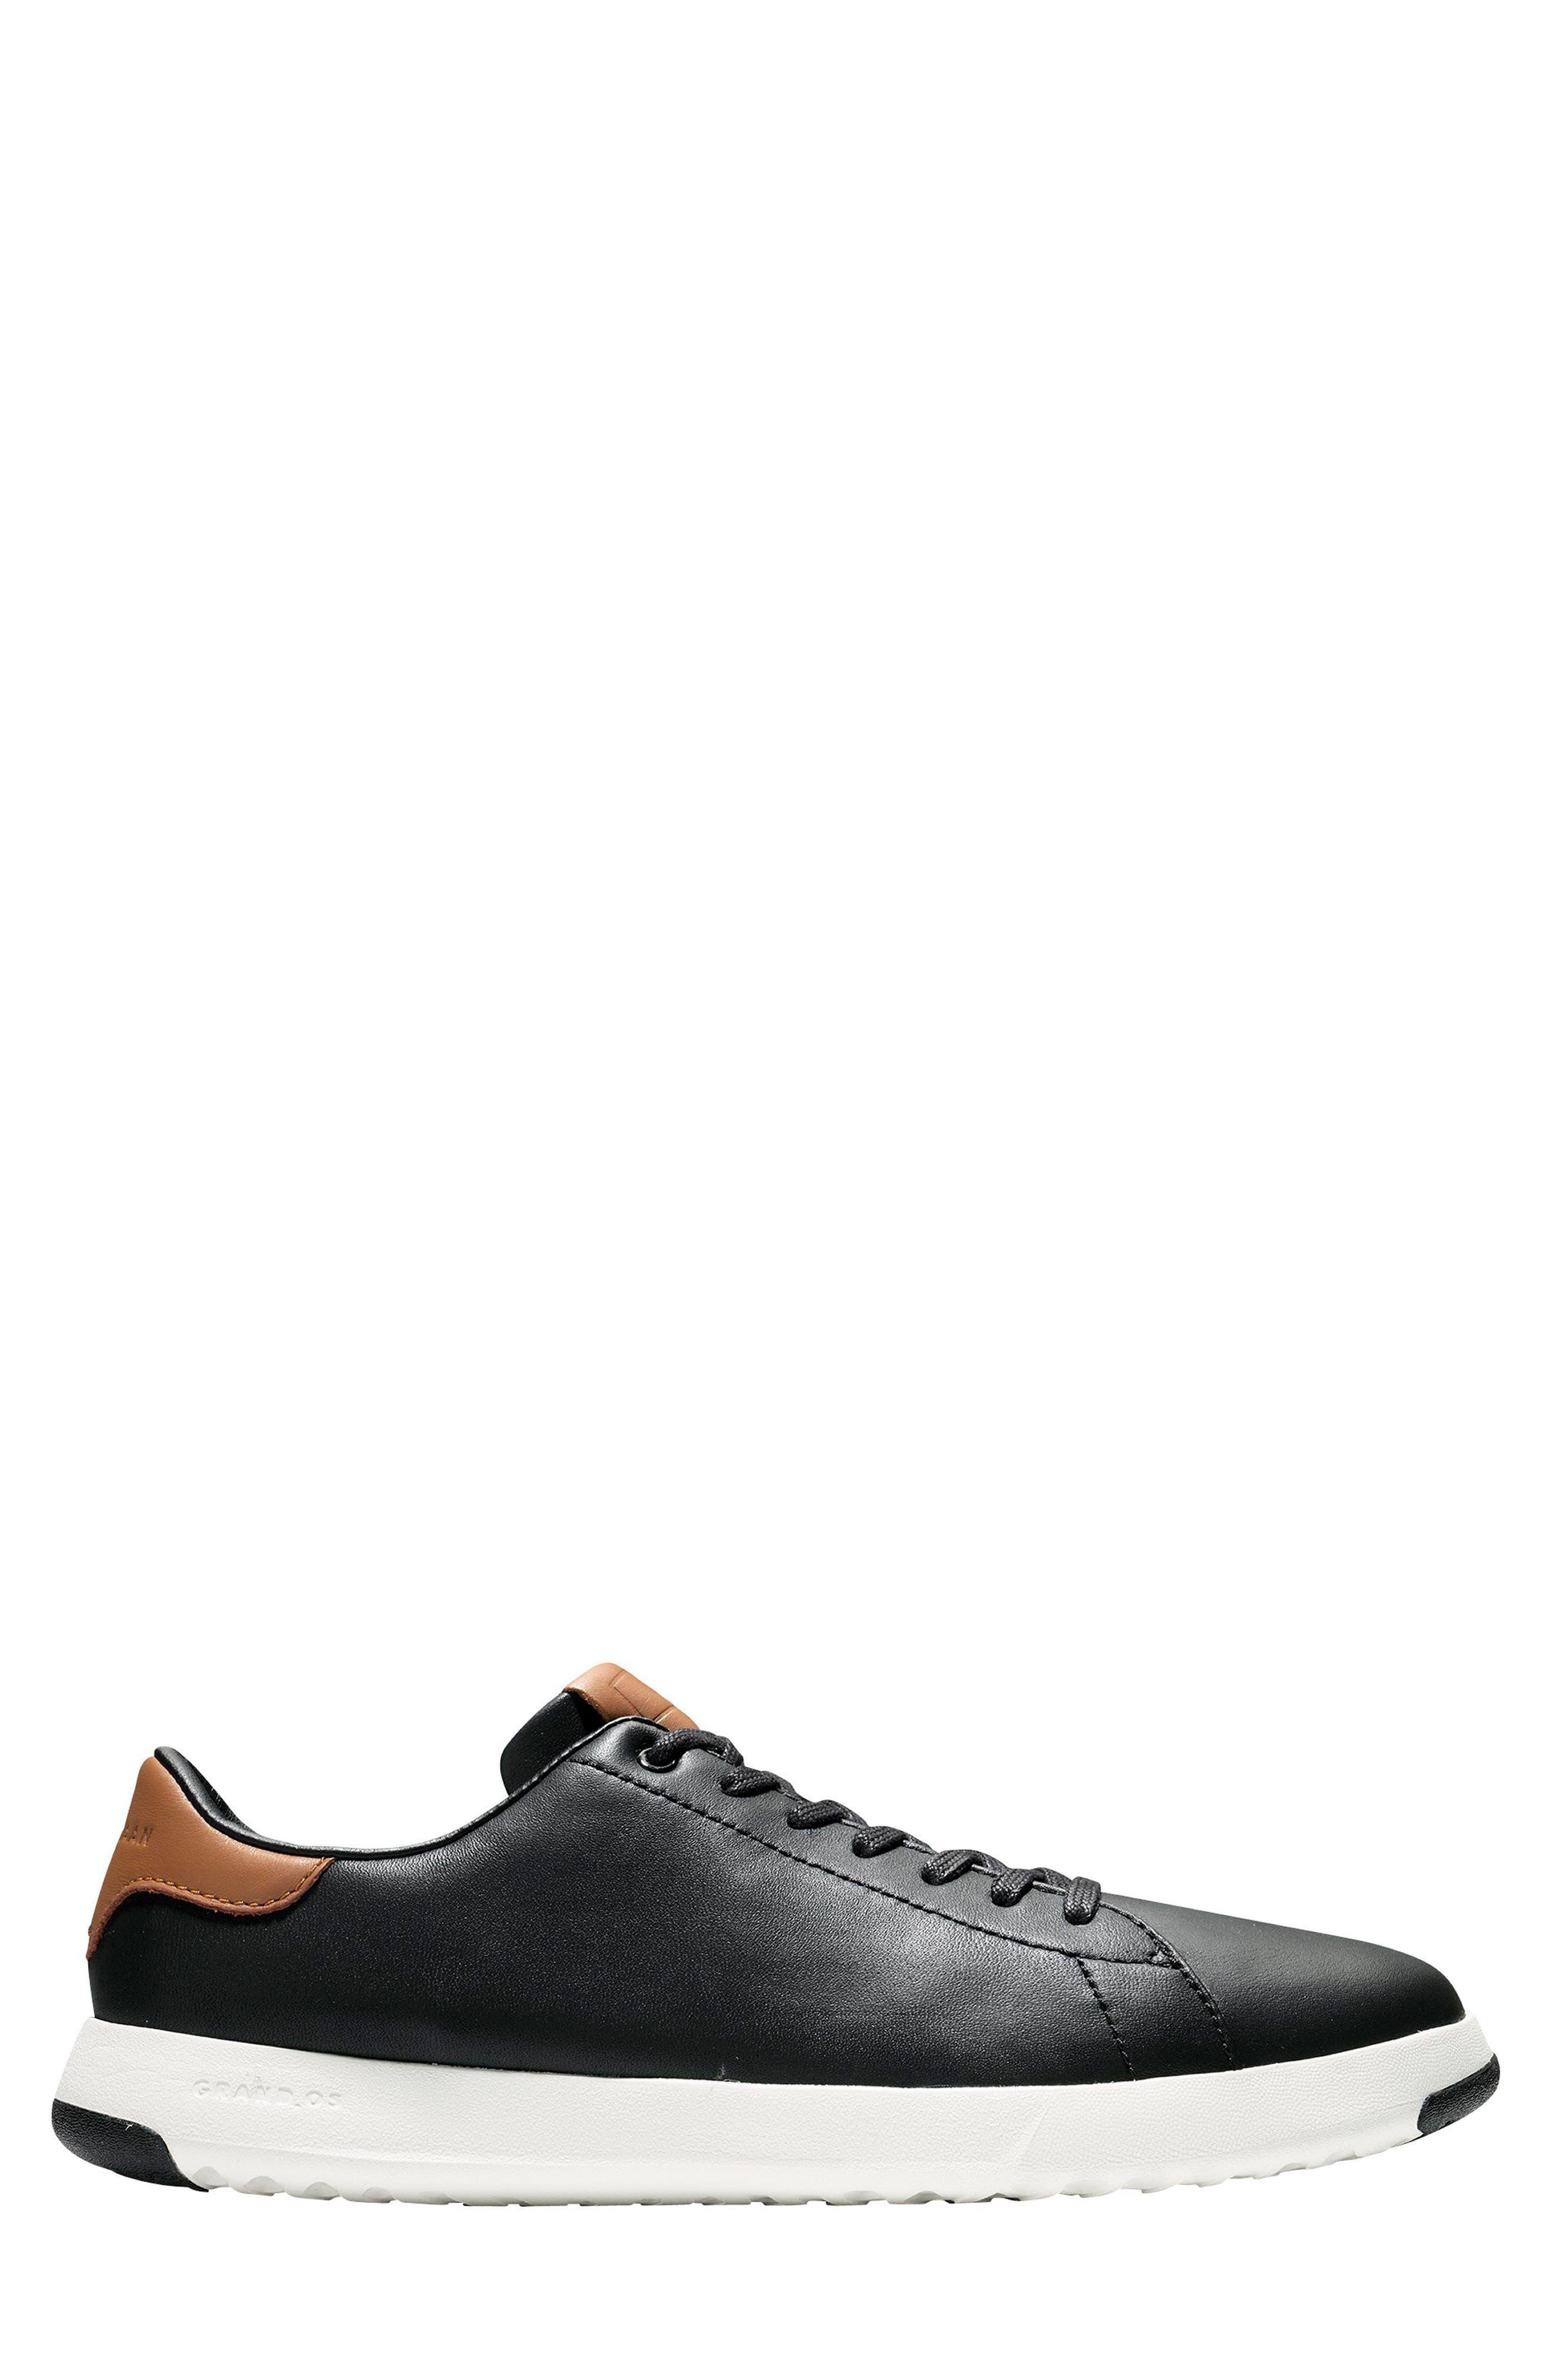 COLE HAAN, GrandPro Tennis Sneaker, Alternate thumbnail 3, color, BLACK/ BRITISH TAN